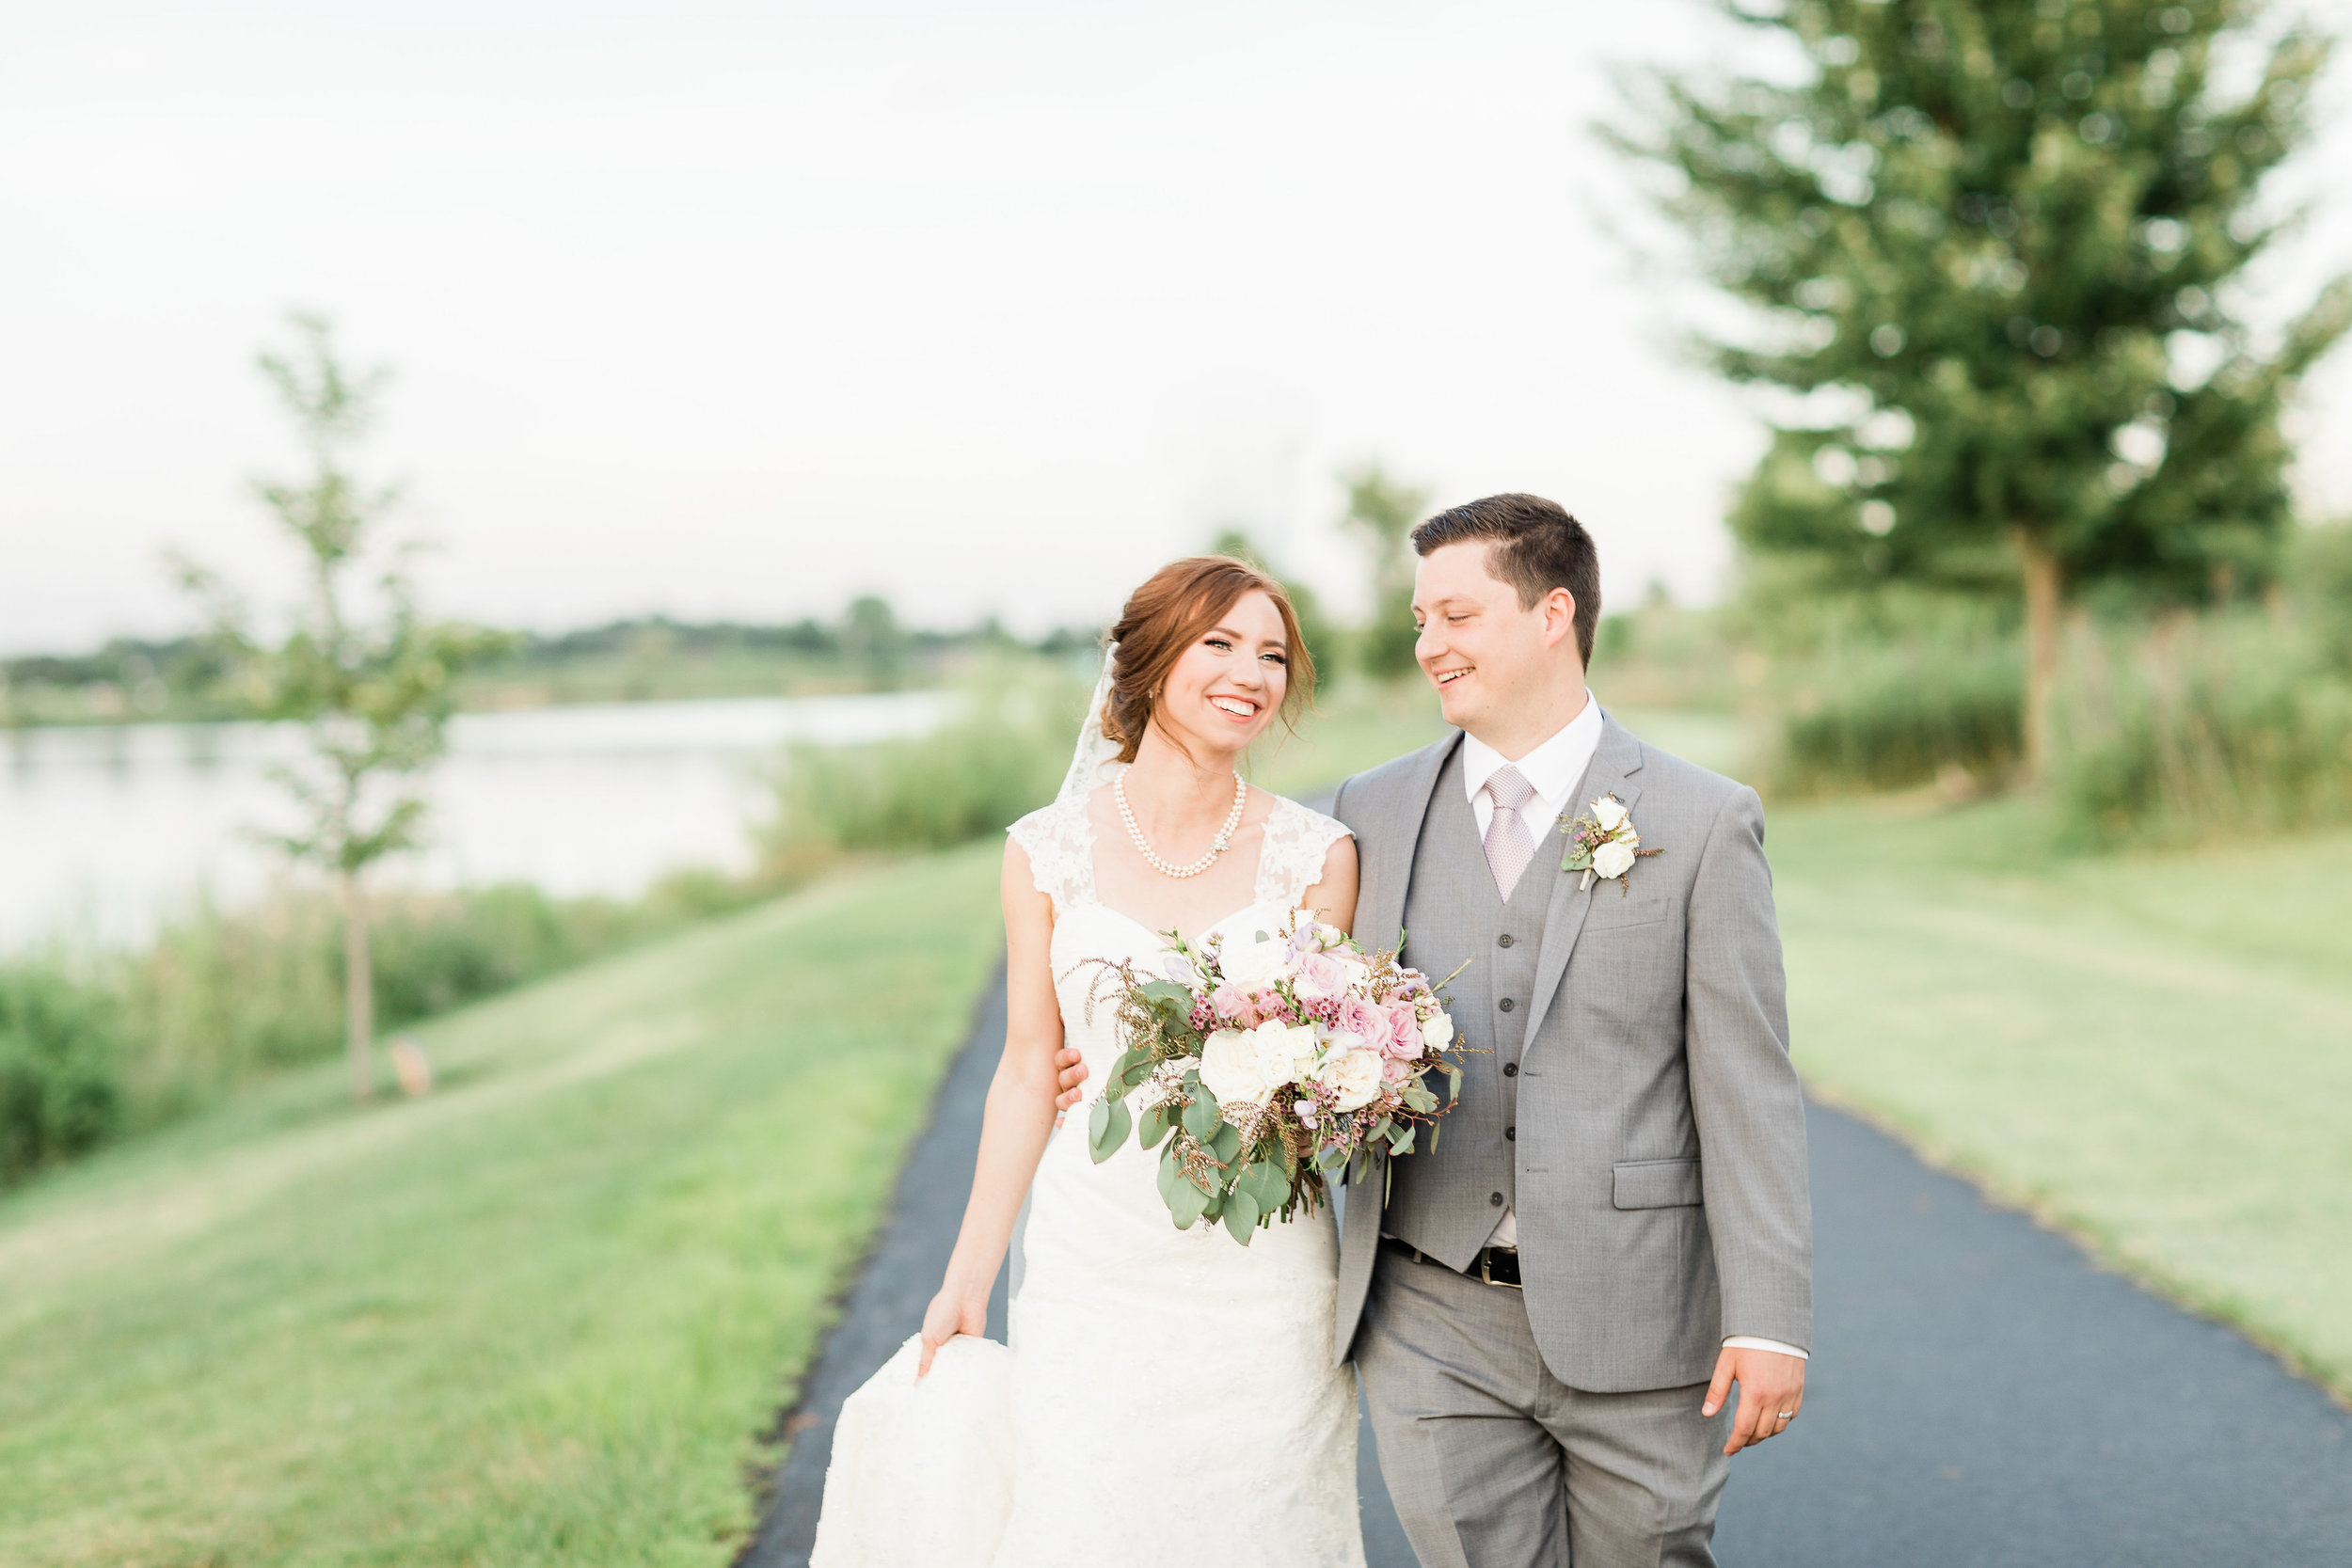 lauren day photography cincinnati wedding photographers -9.jpg